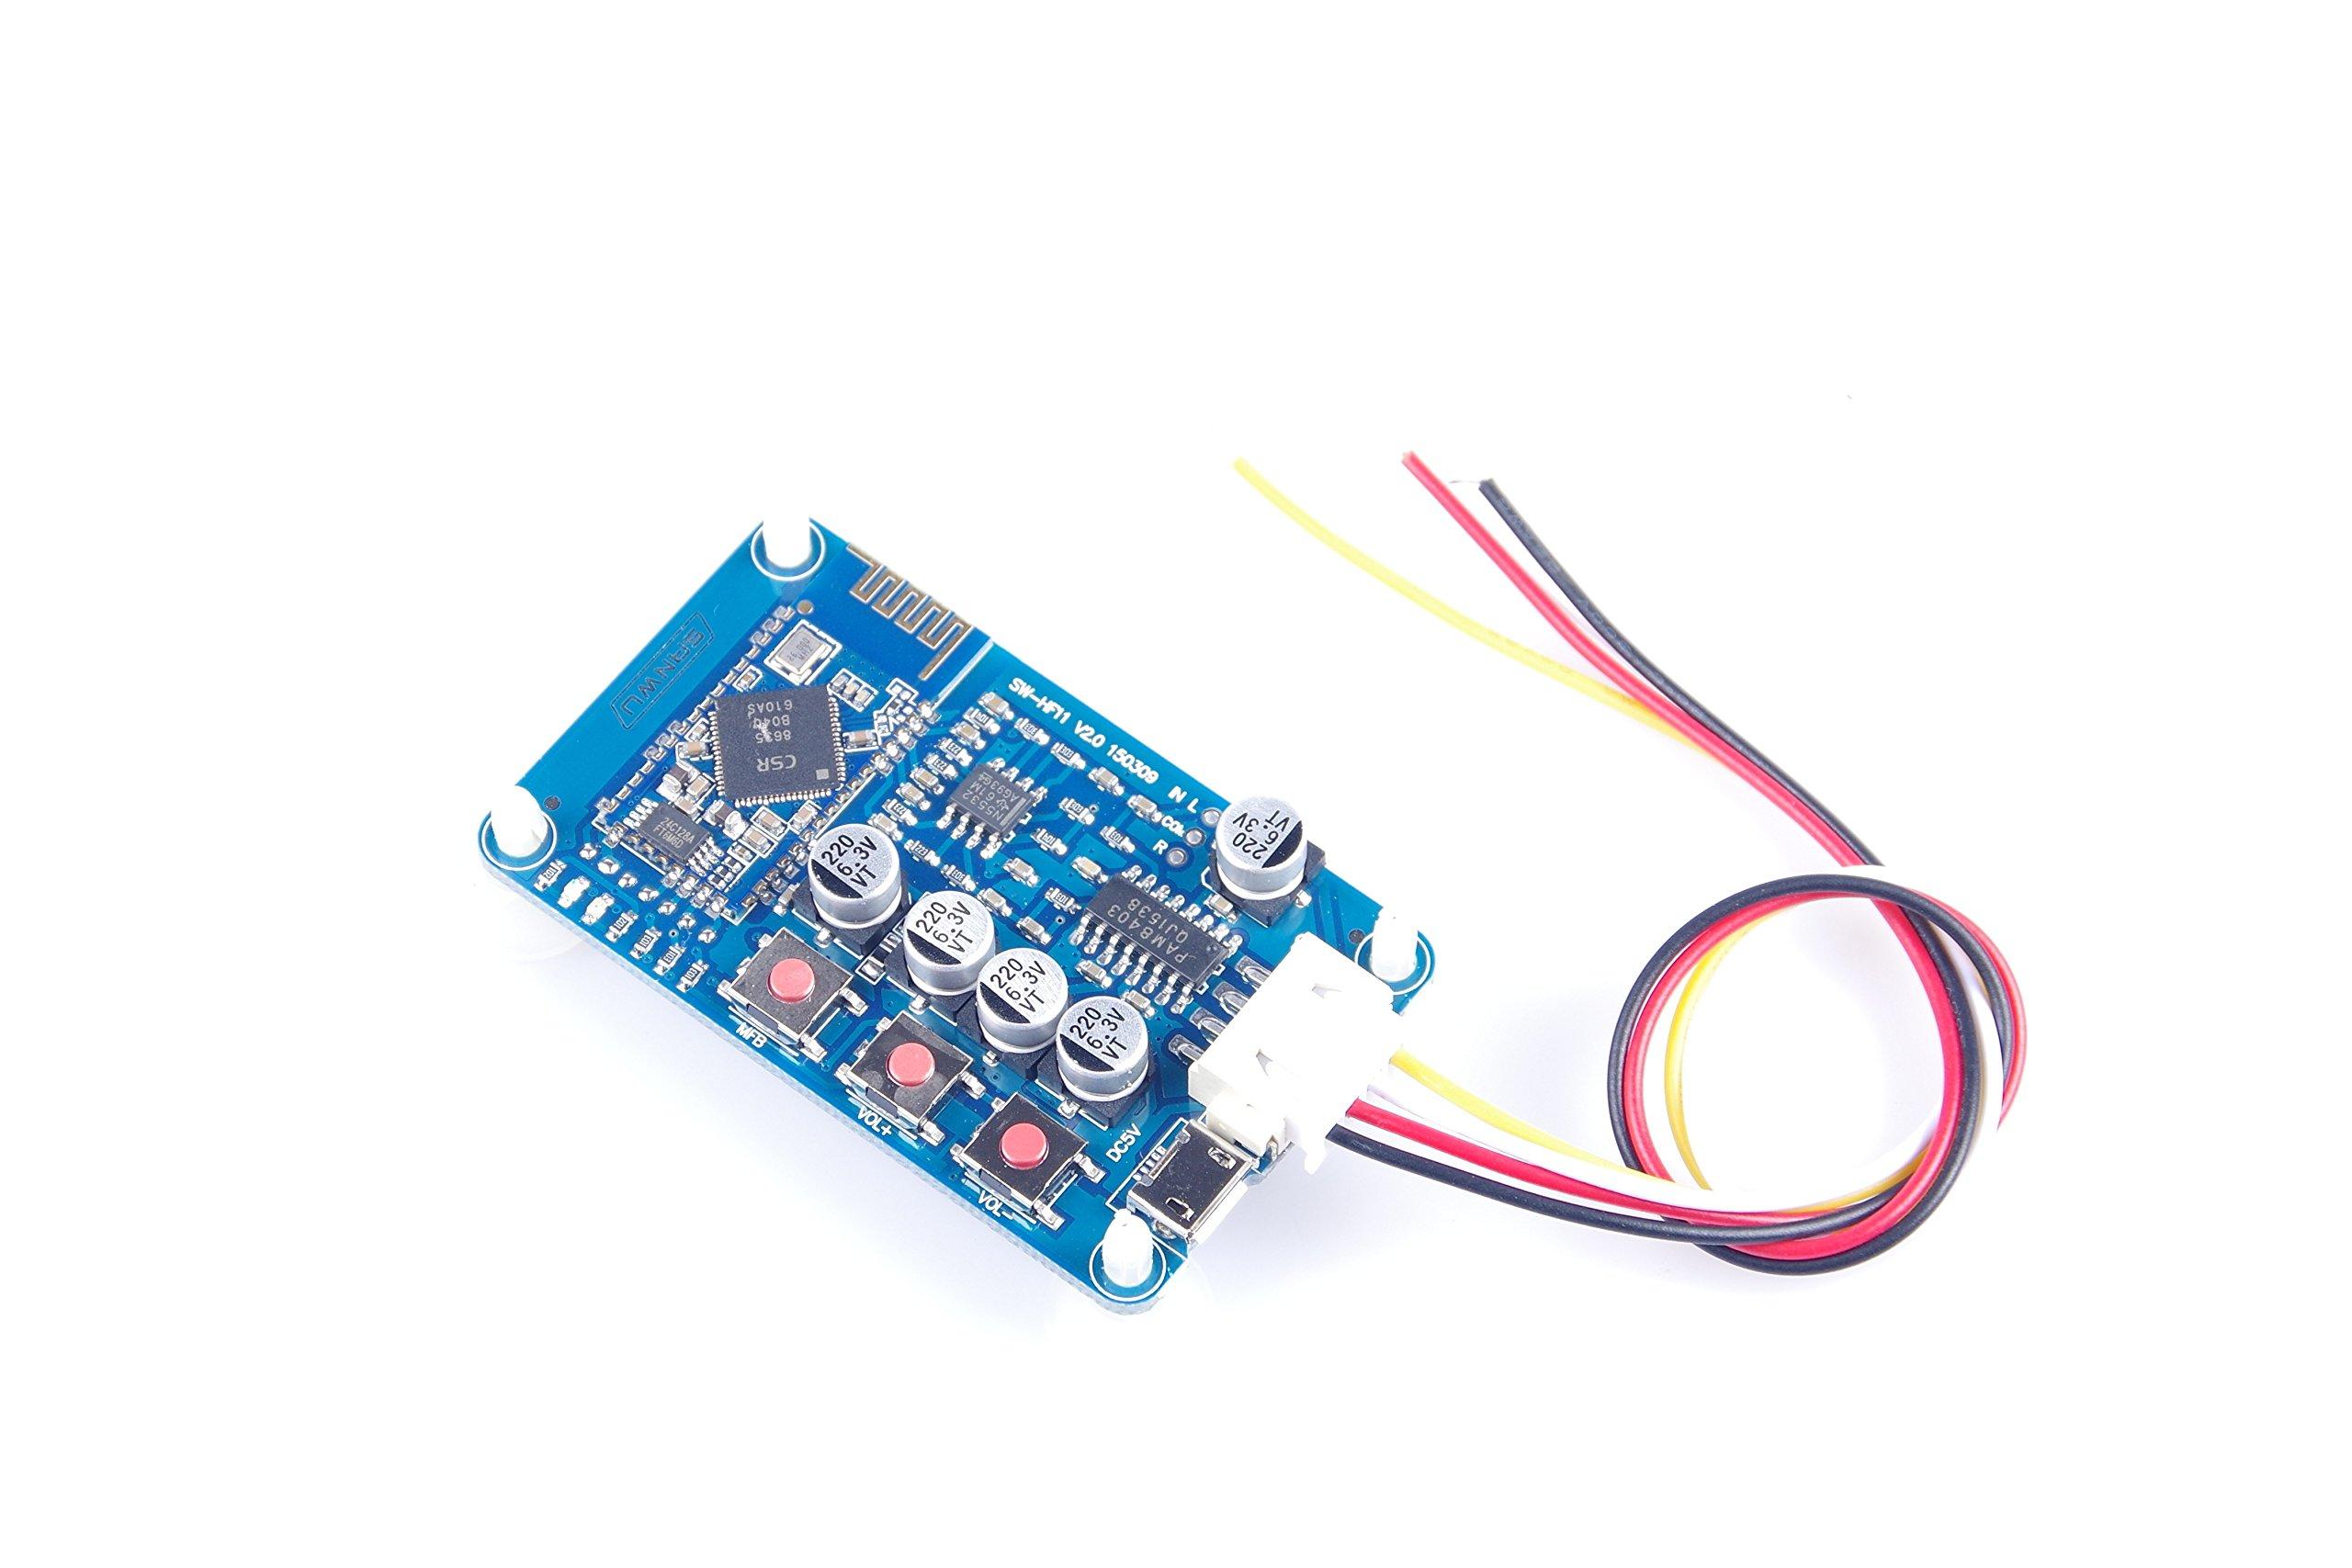 KNACRO Wireless Bluetooth 4.0 Audio Receiver Board Stereo Digital Amplifier Module Mini USB 5V